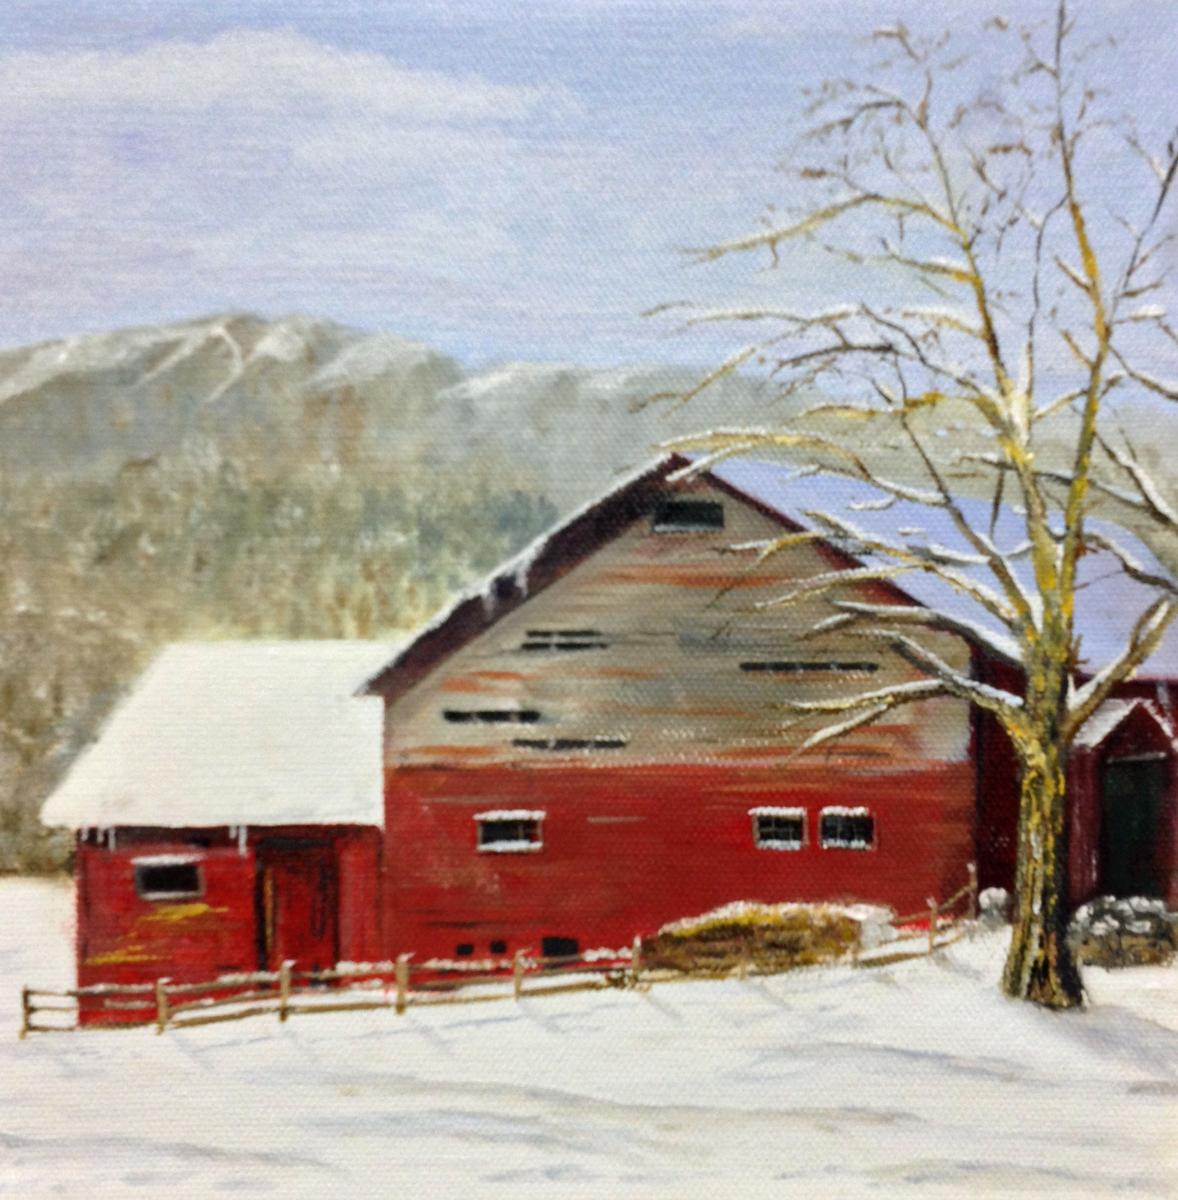 Adirondack Red Barn (large view)